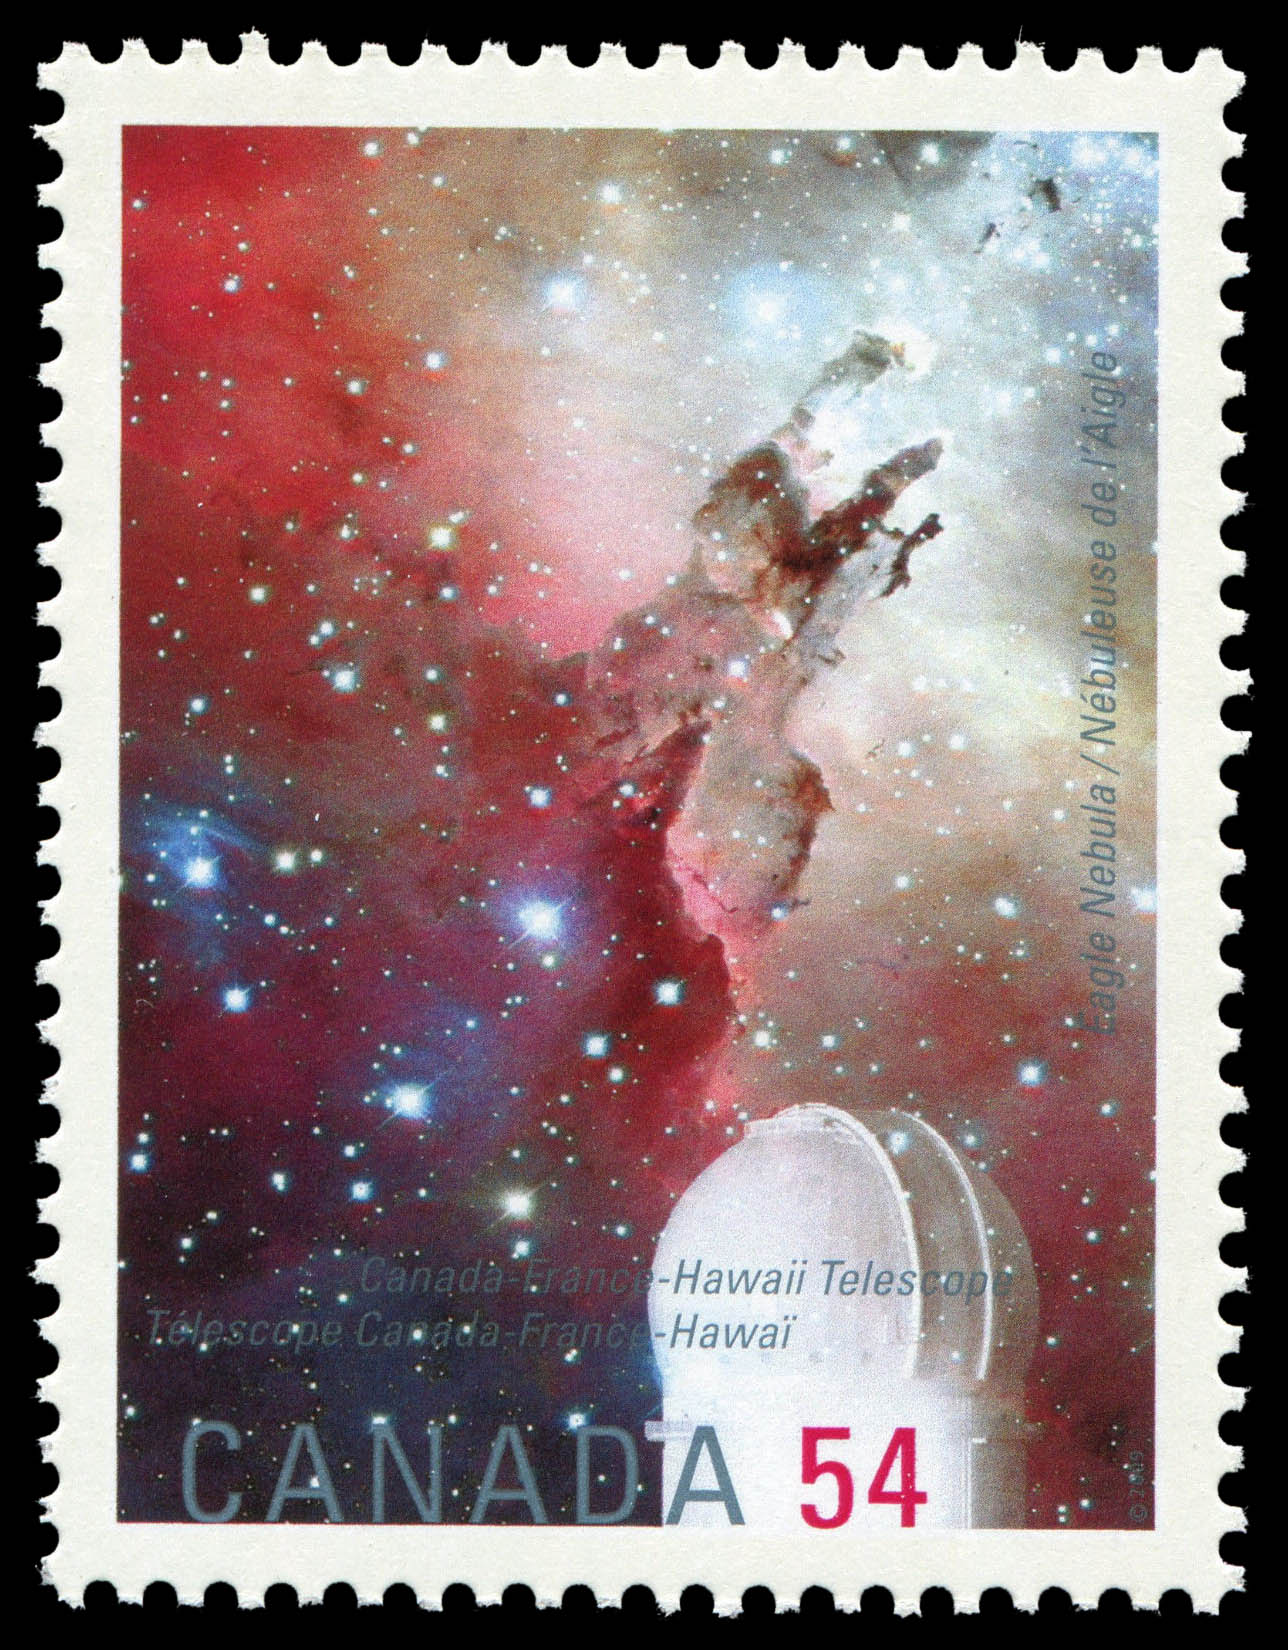 Eagle Nebula, Canada-France-Hawaii Telescope Canada Postage Stamp